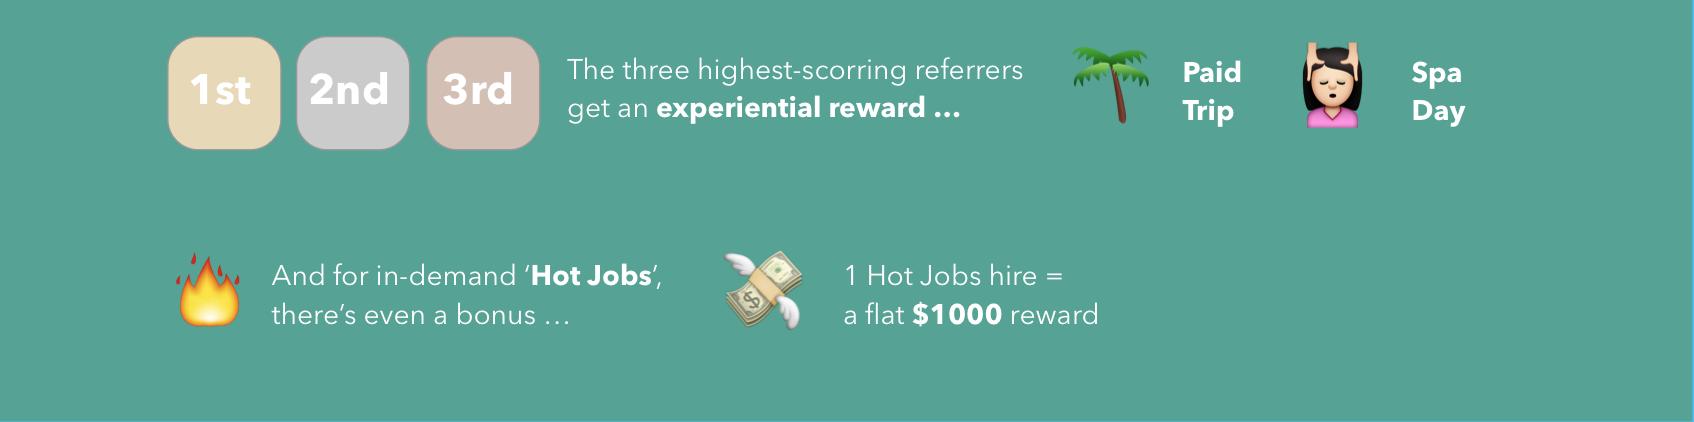 Sendgrid referral reward paid vacation